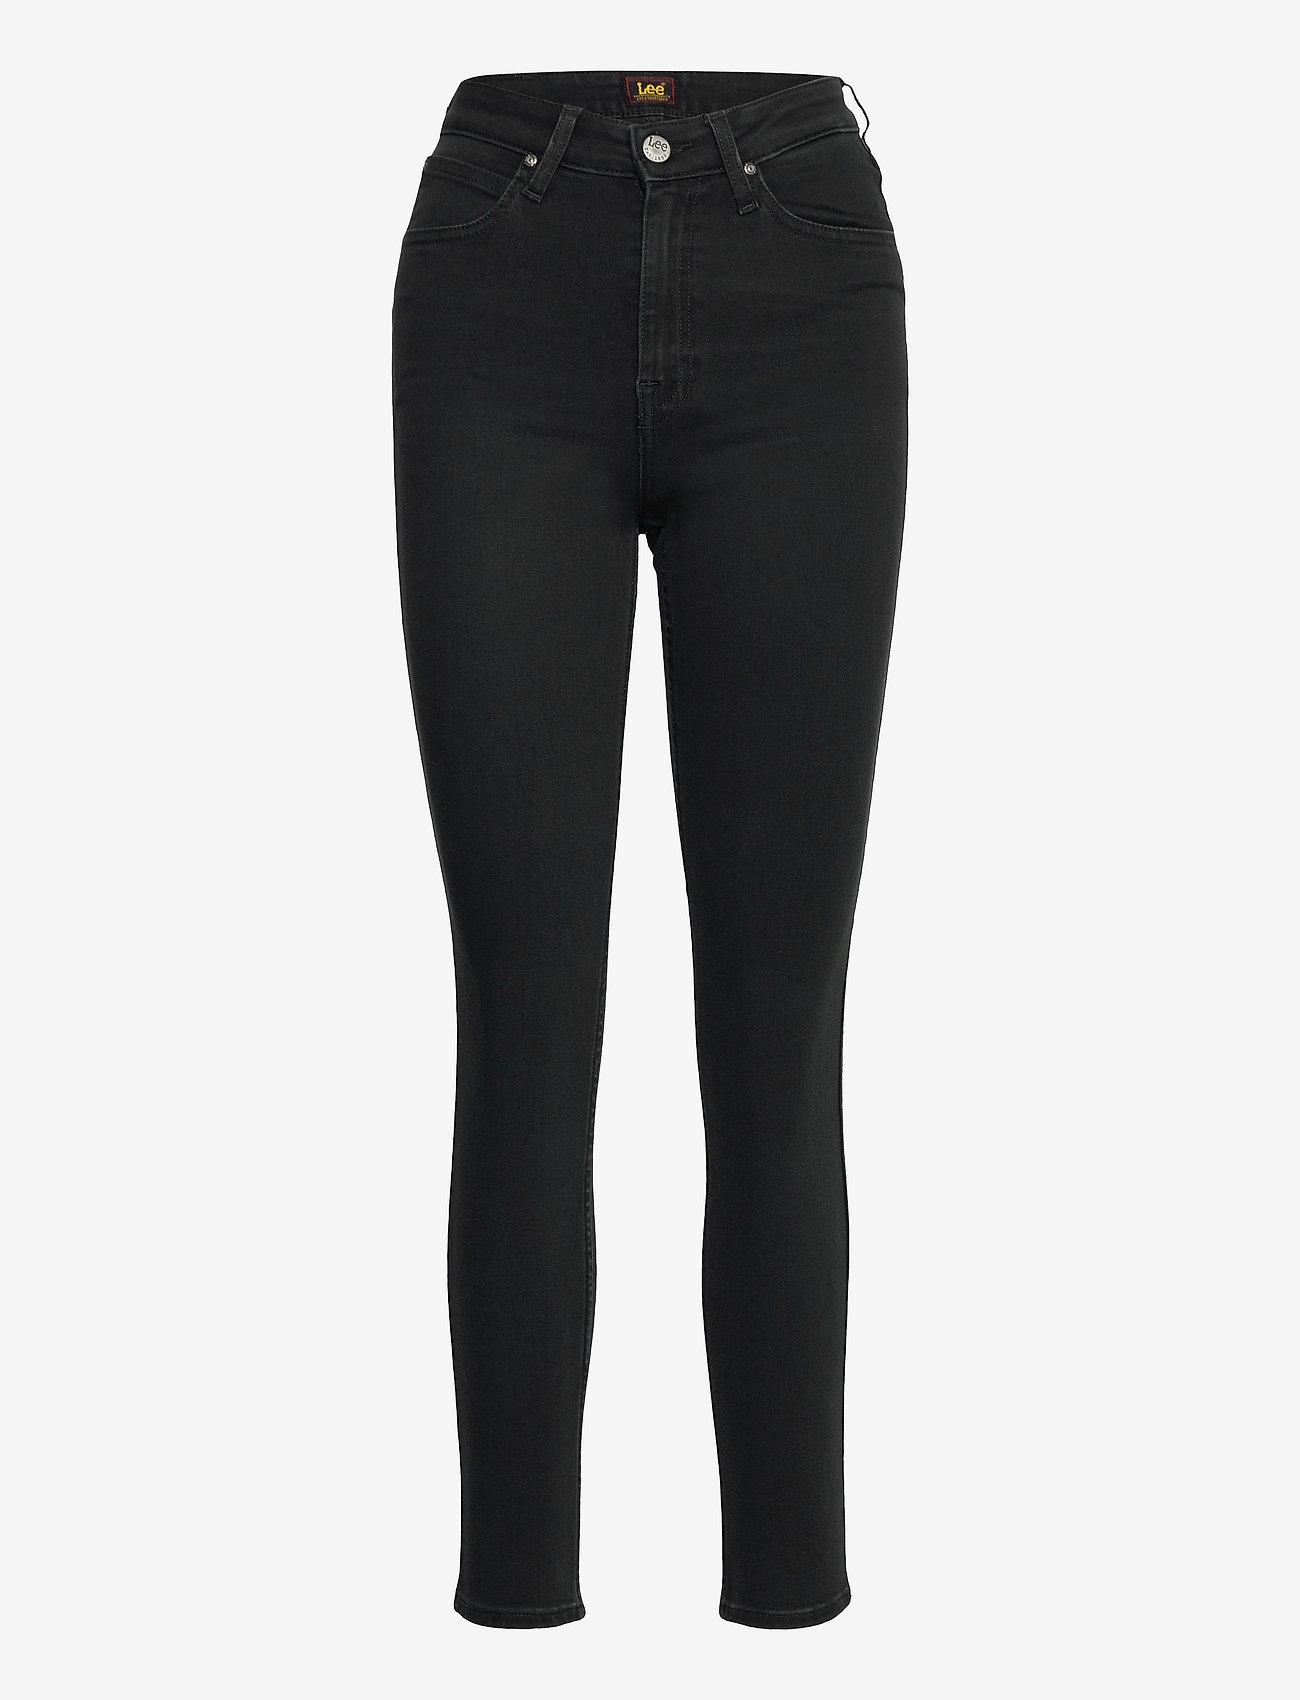 Lee Jeans - IVY - skinny jeans - pavia worn - 0